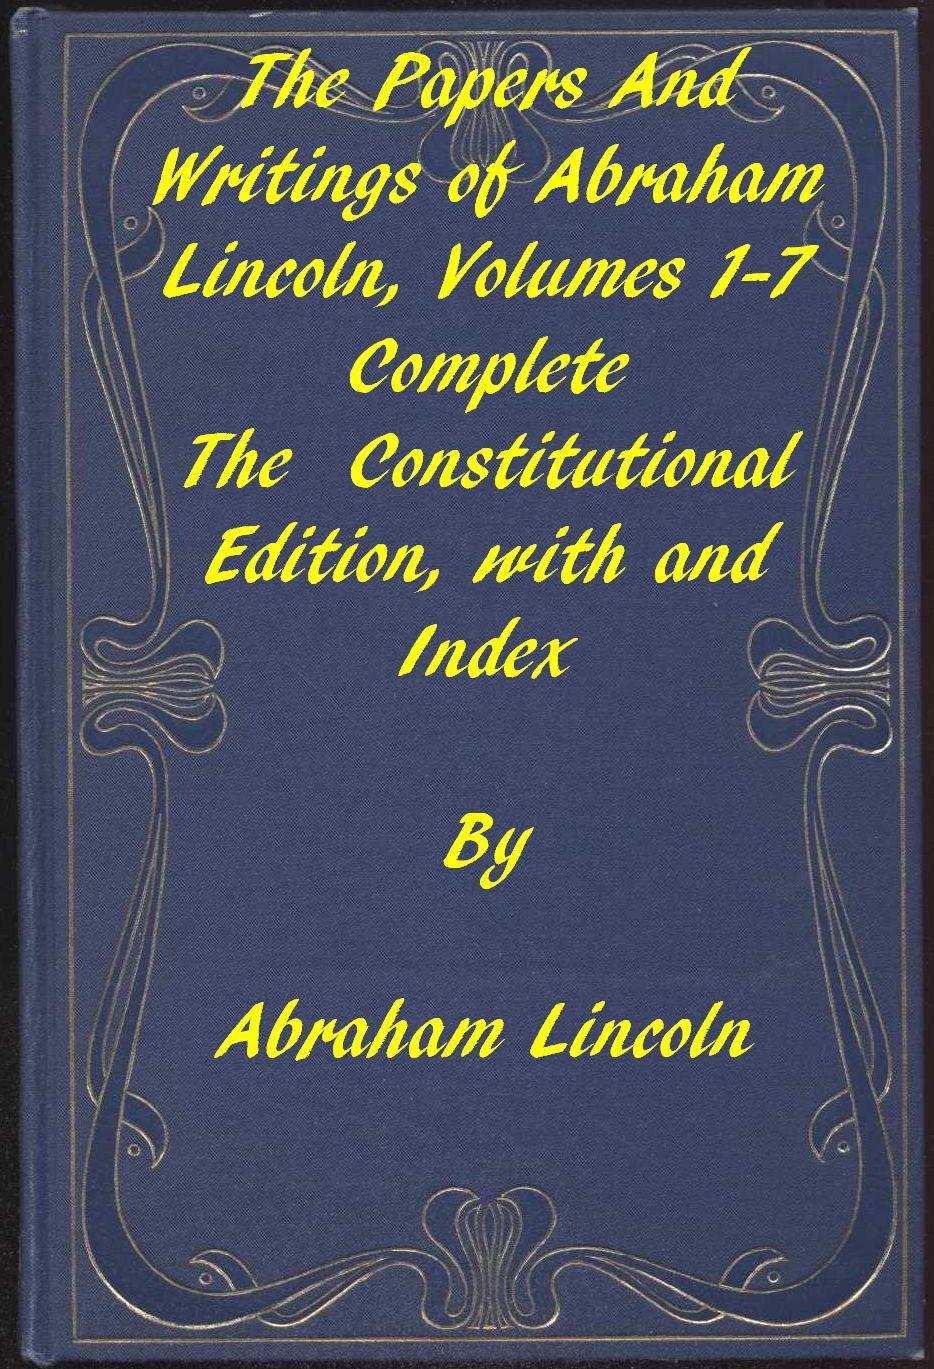 Abraham Lincoln Views On Slavery